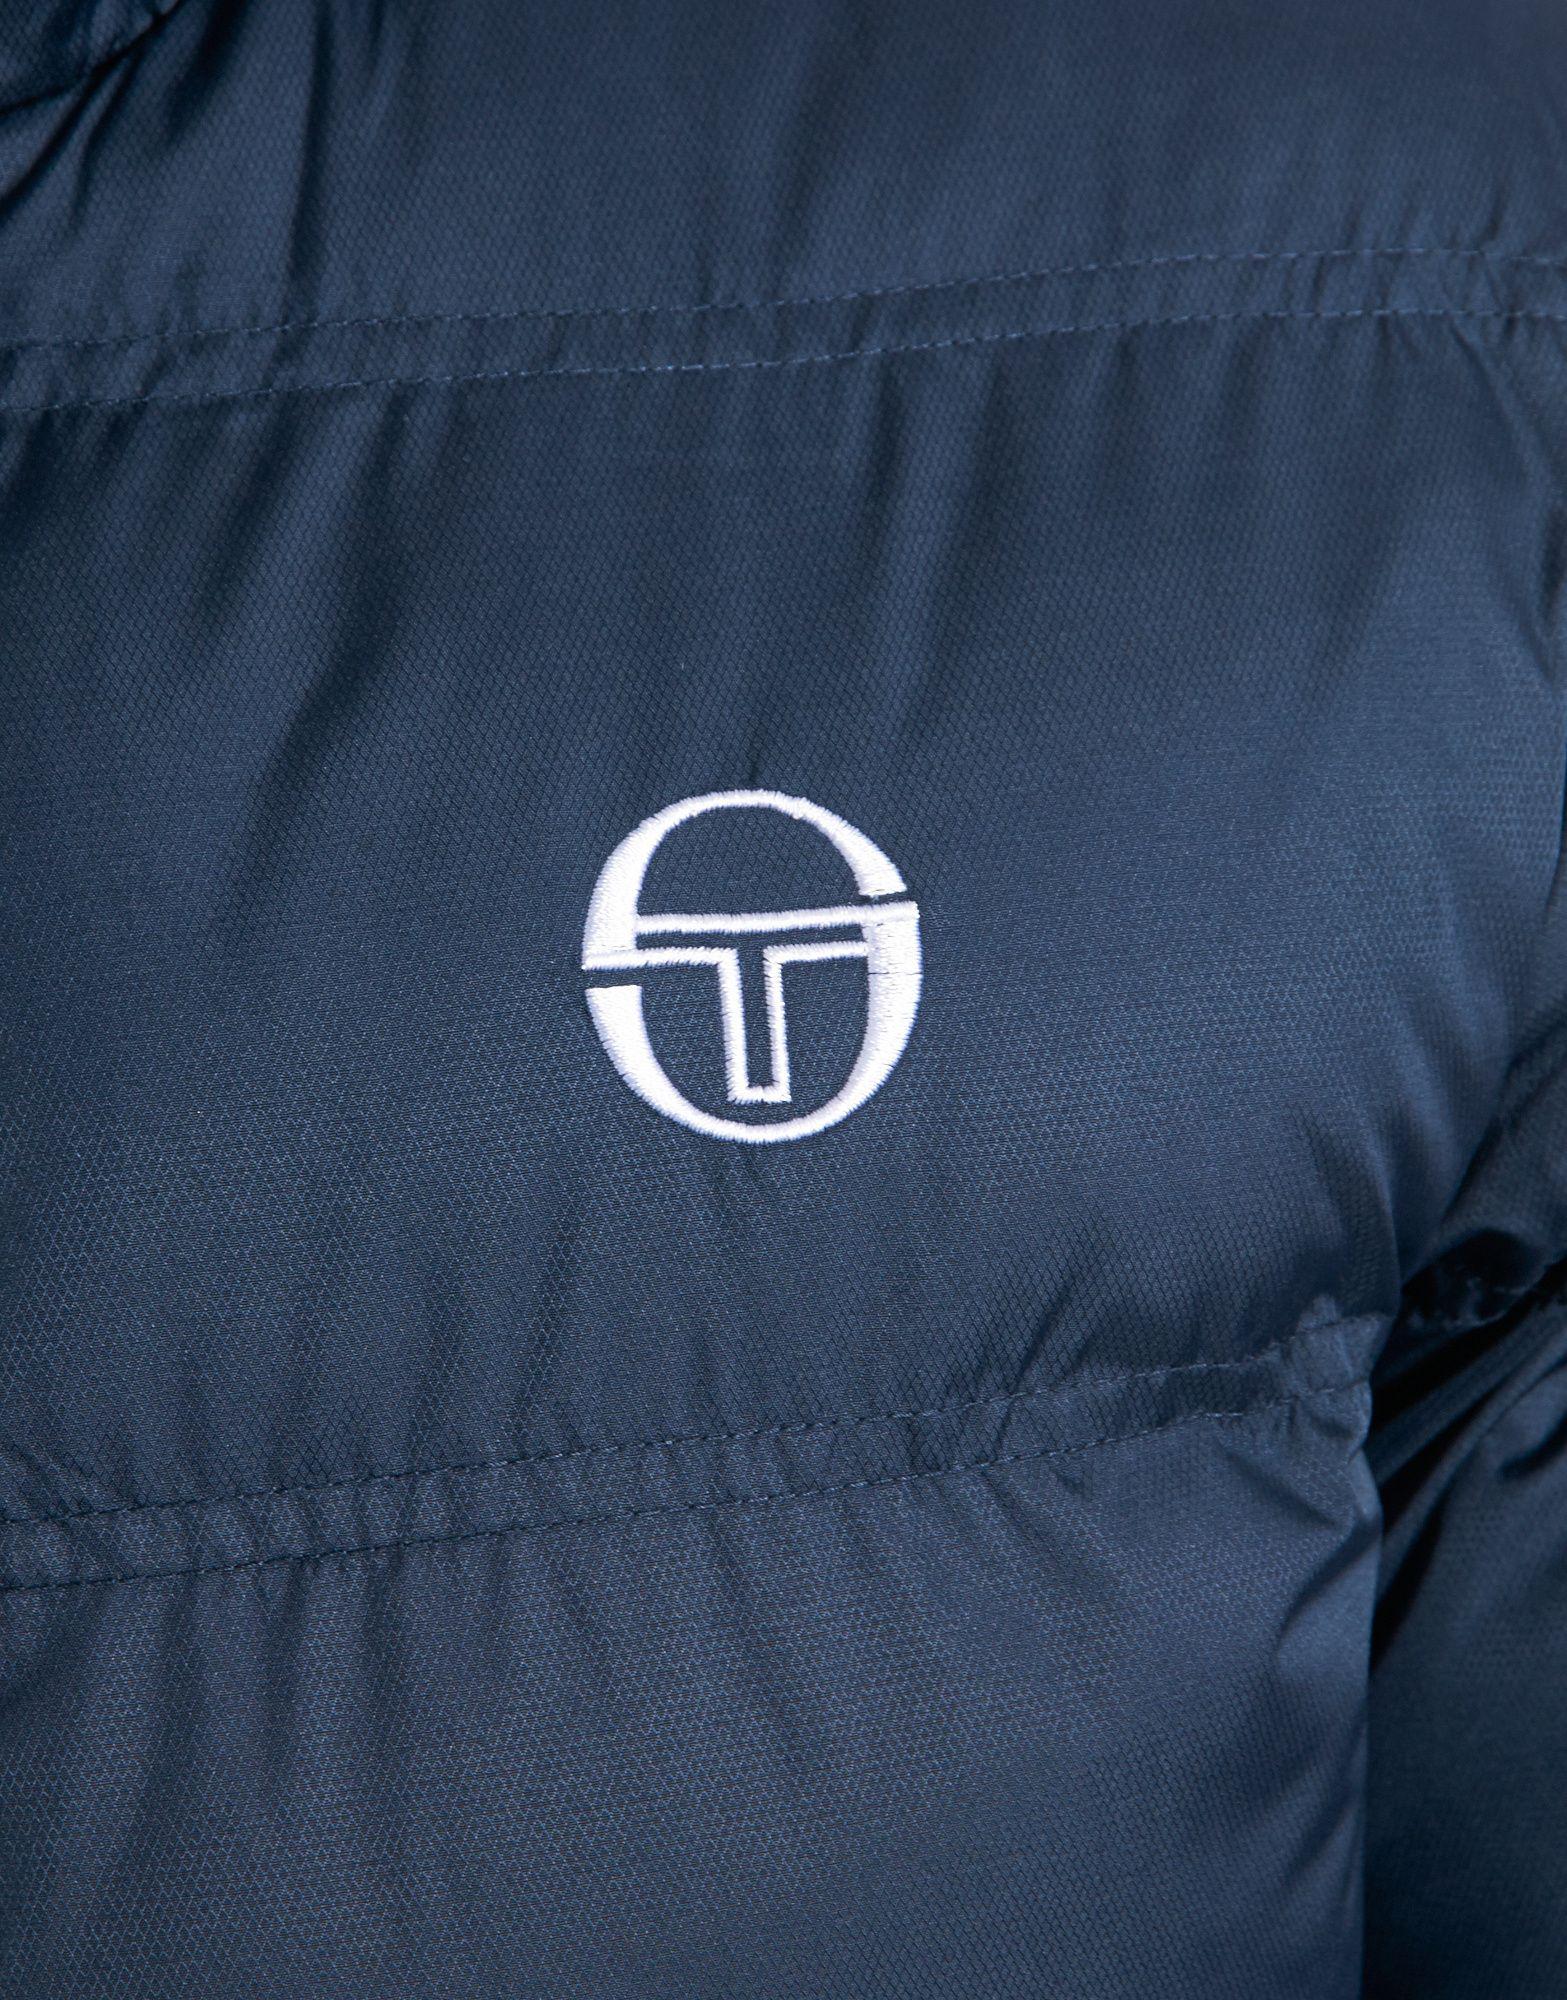 Sergio Tacchini Rome Baseball Jacket